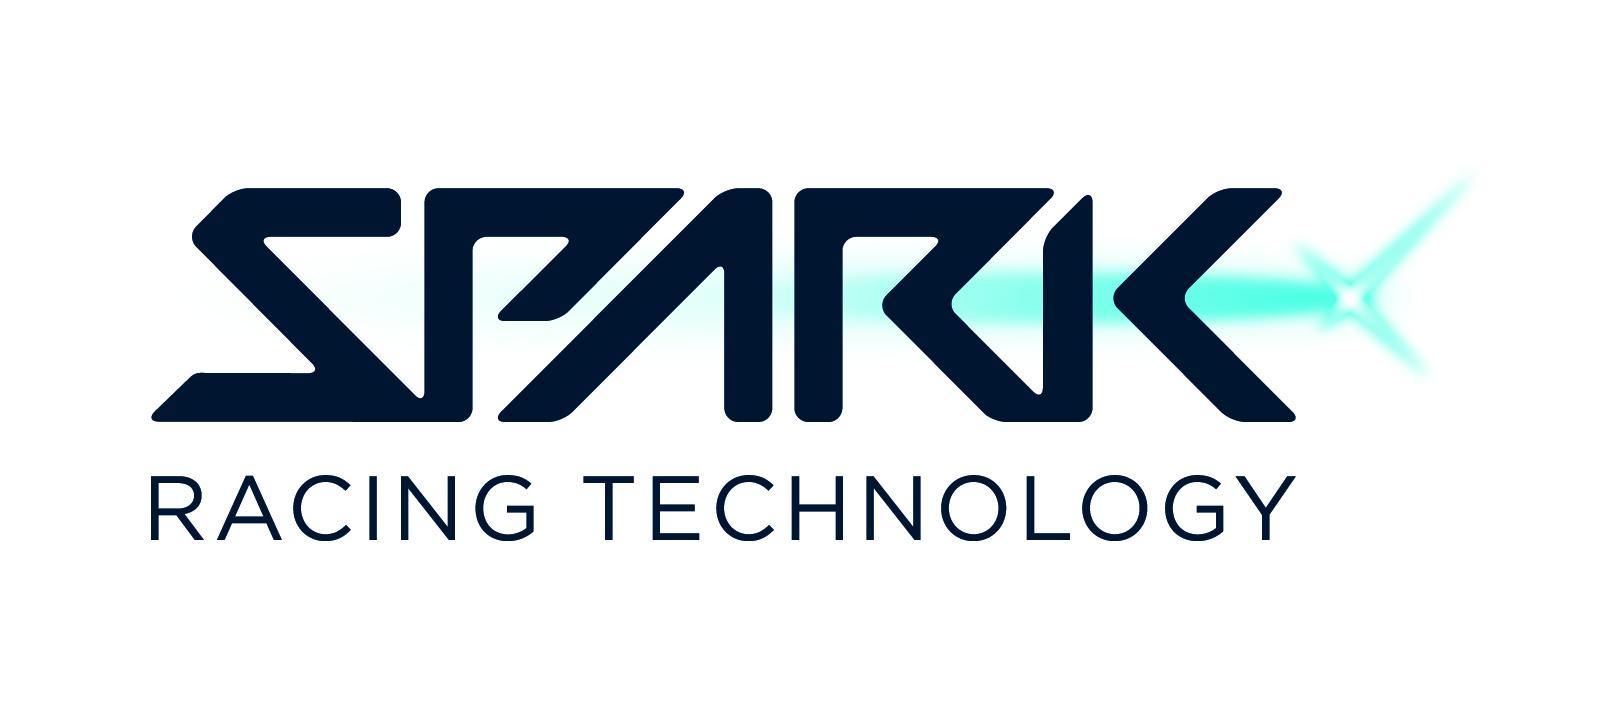 Spark Racing Technology   Dassault Systèmes